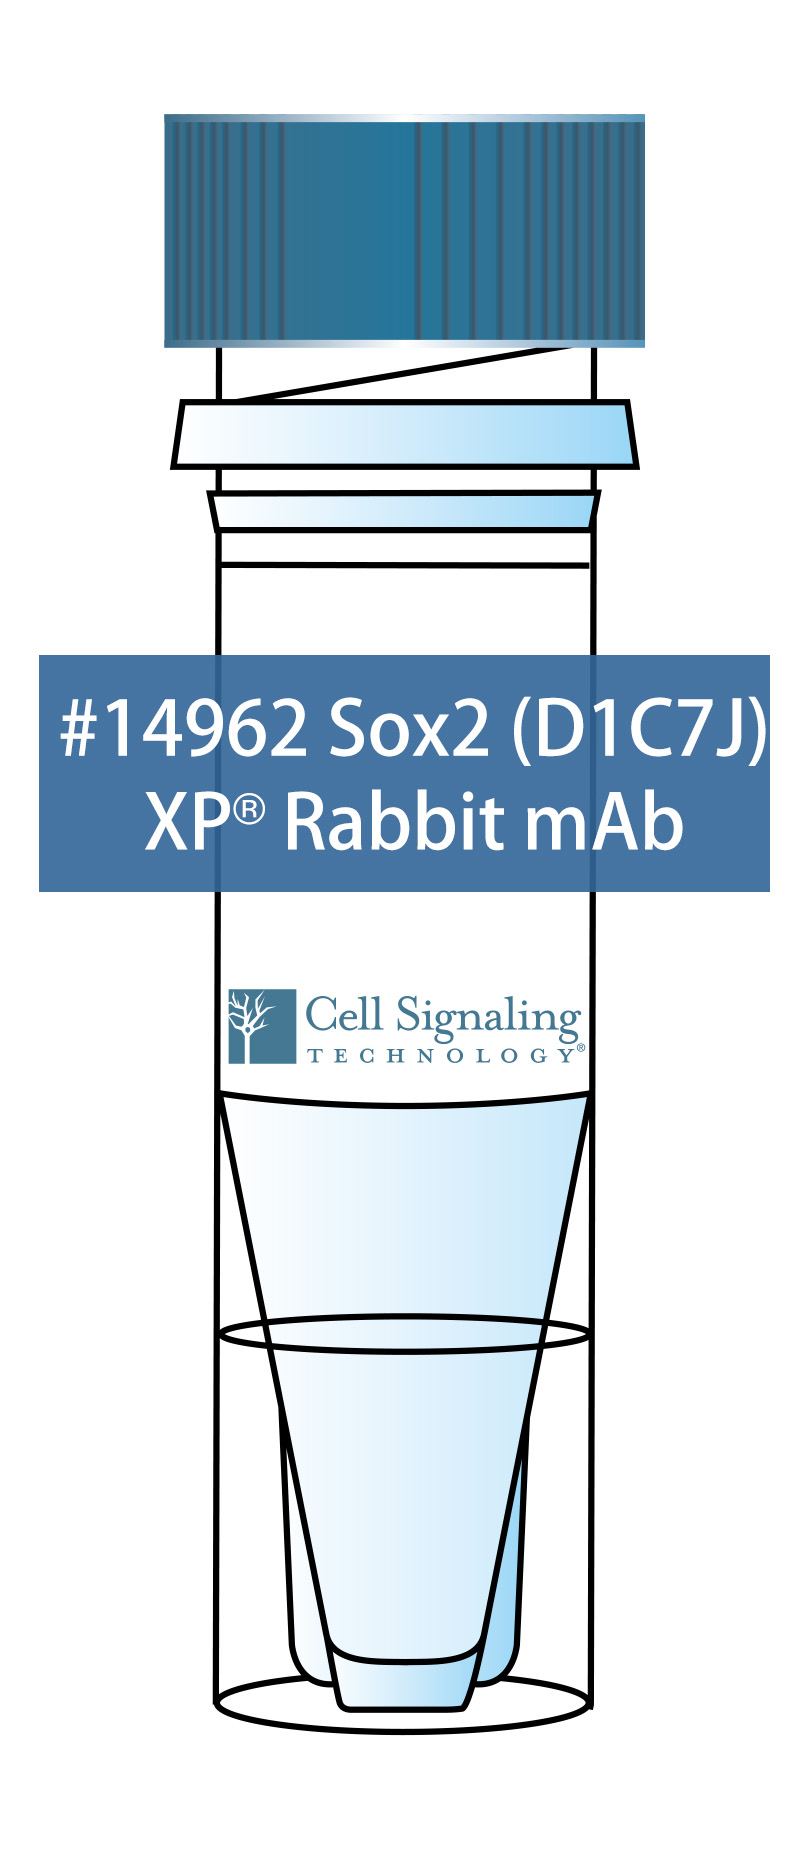 Sox2 (D1C7J) XP® Rabbit mAb